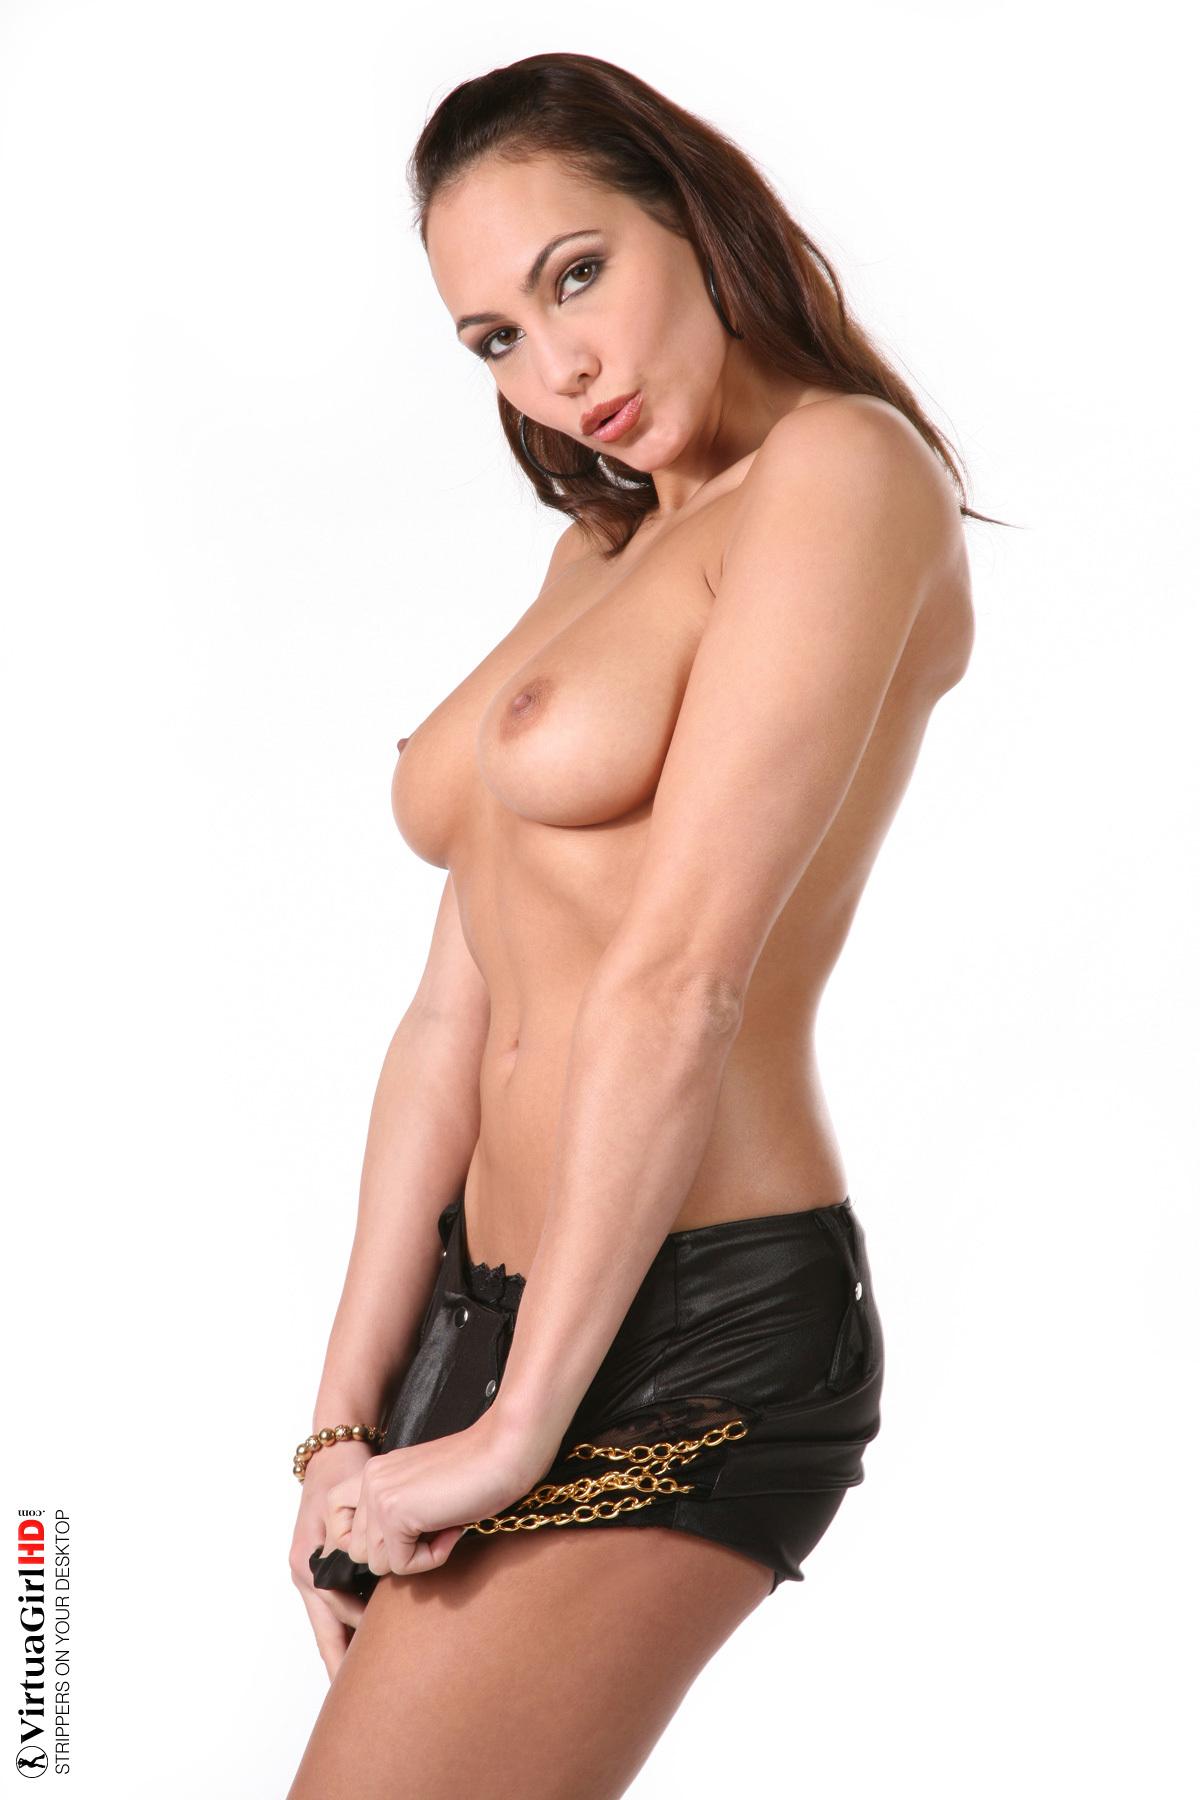 girls stripping vids tumblr